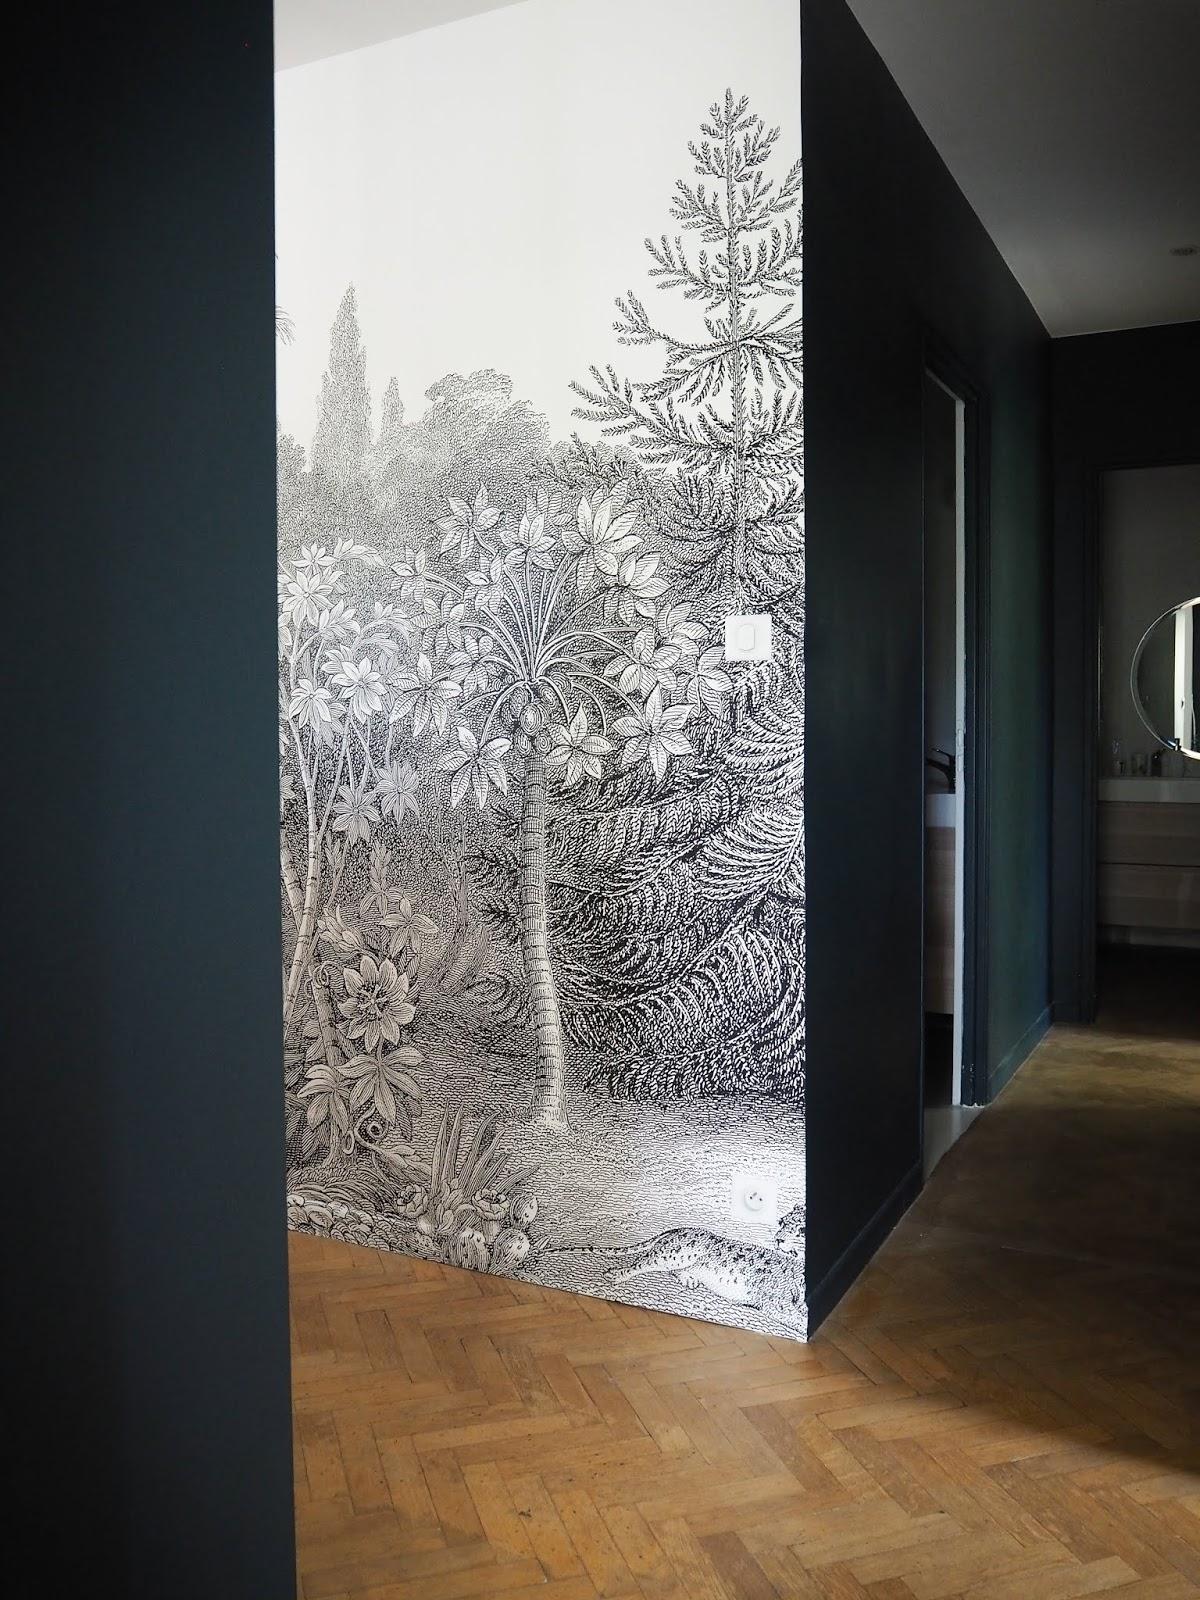 ilaria fatone x rebel walls - panoramic wallpaper in hallway